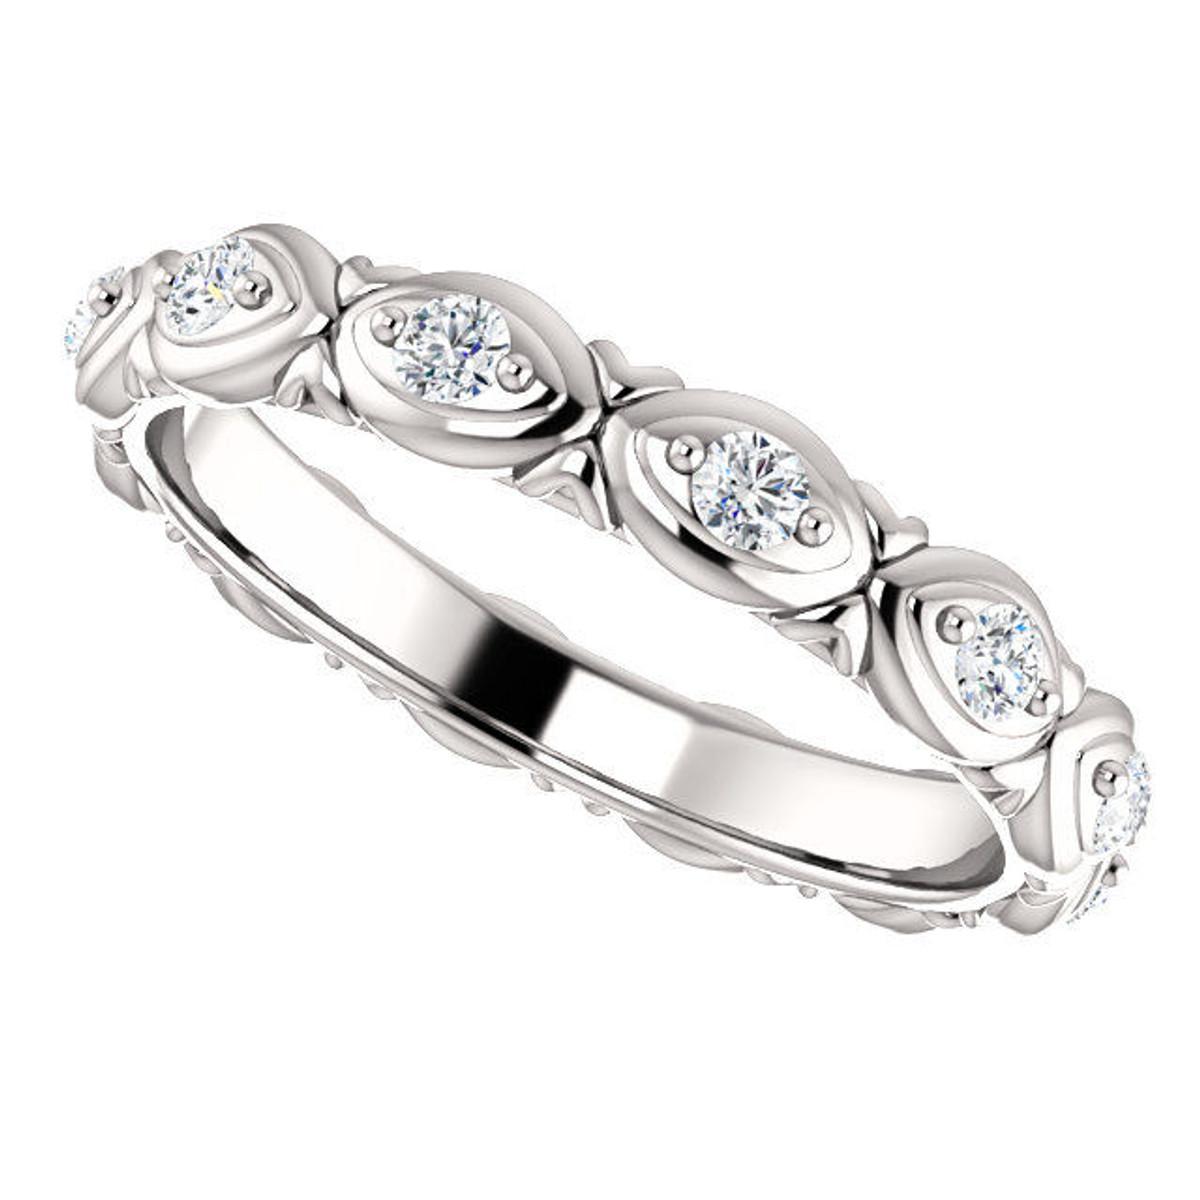 14Kt White Gold Stackable Diamond Eternity Ring